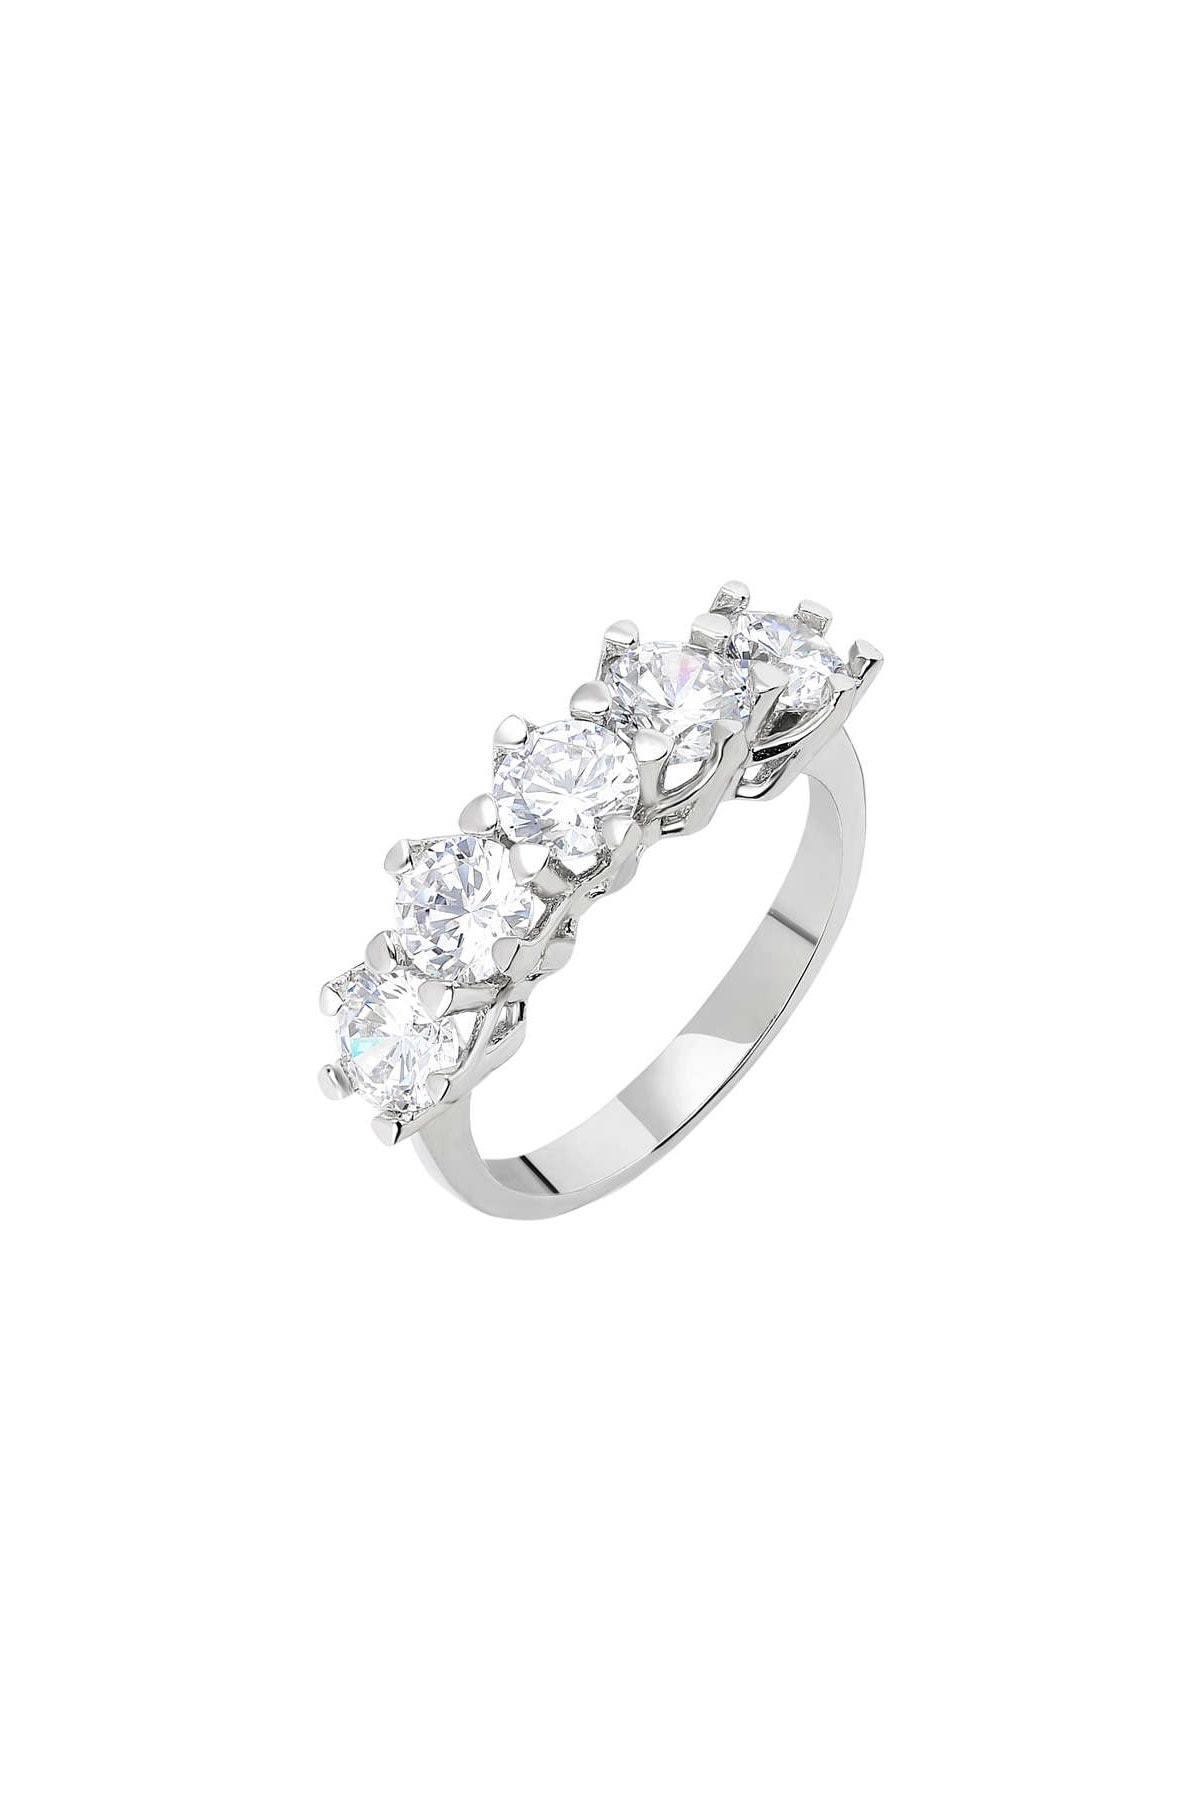 Tesbihane Starlight Diamond Pırlanta Montür 925 Ayar Gümüş Bayan Beştaş Yüzük 102001816 3